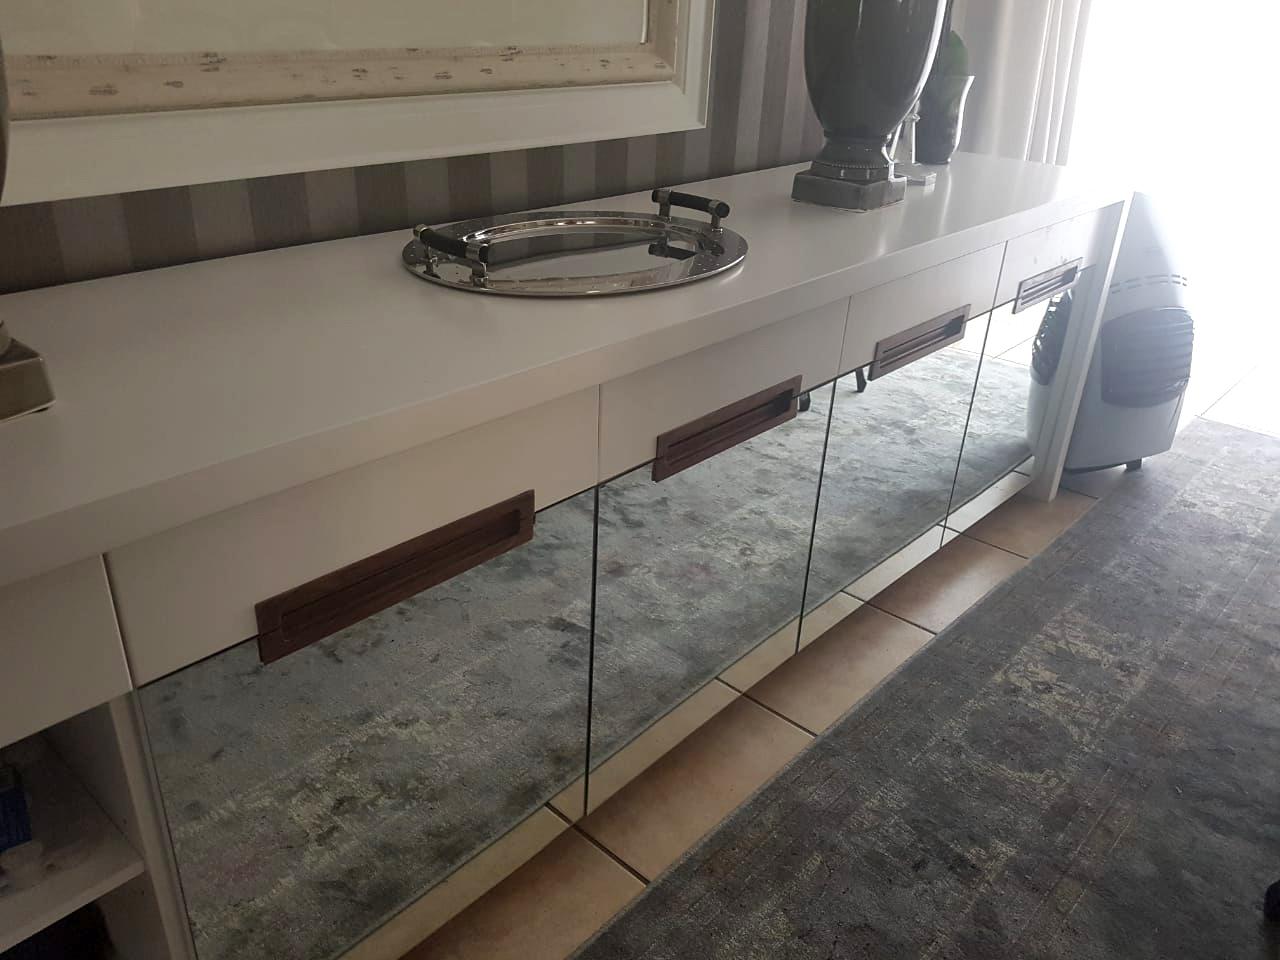 Design Furniture - Counter